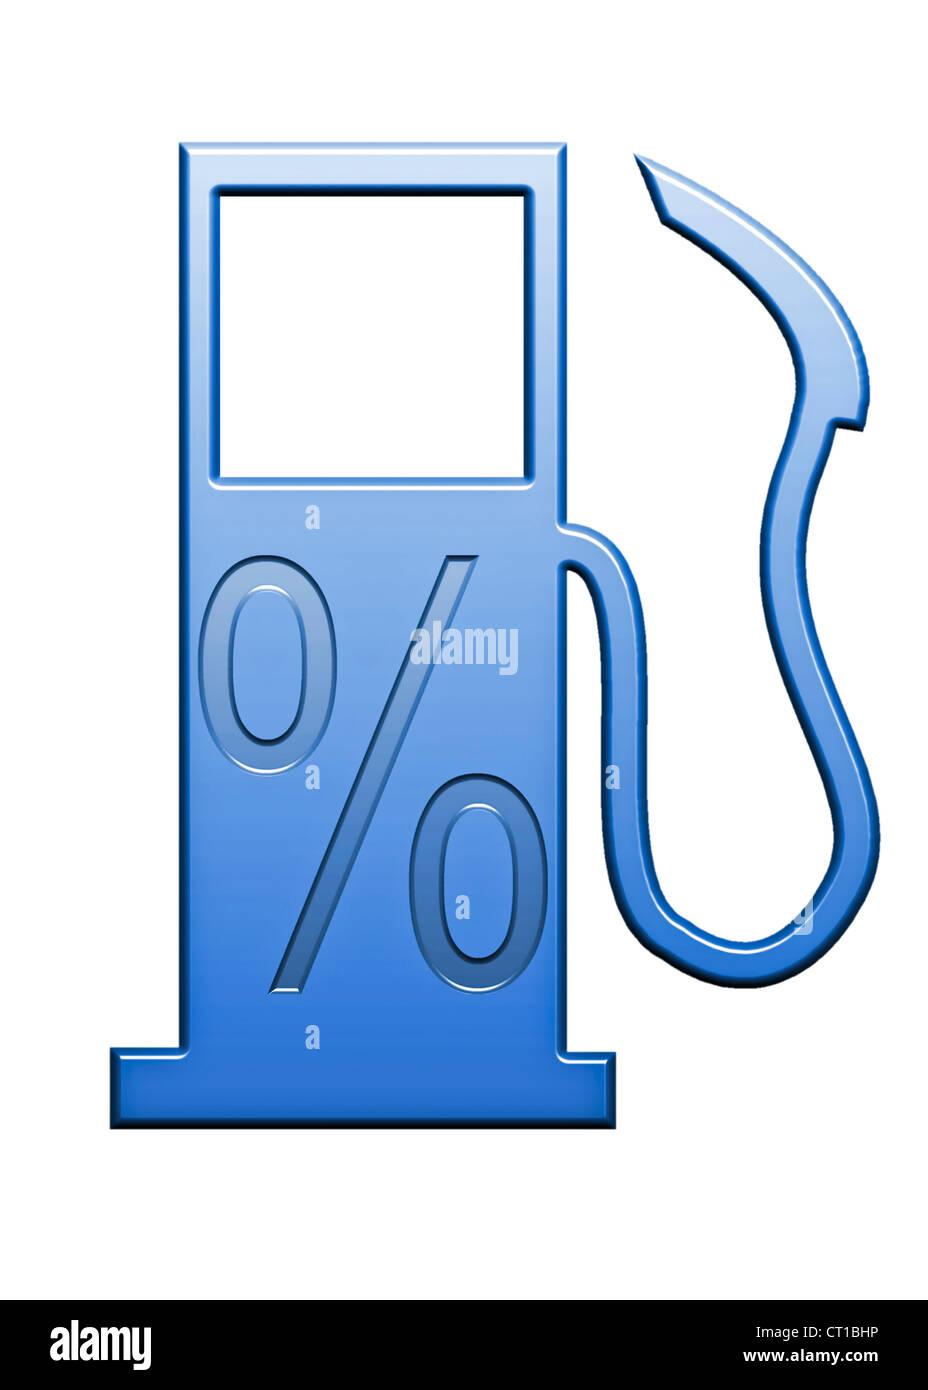 percentage sign on a symbolic gas pump Stock Photo